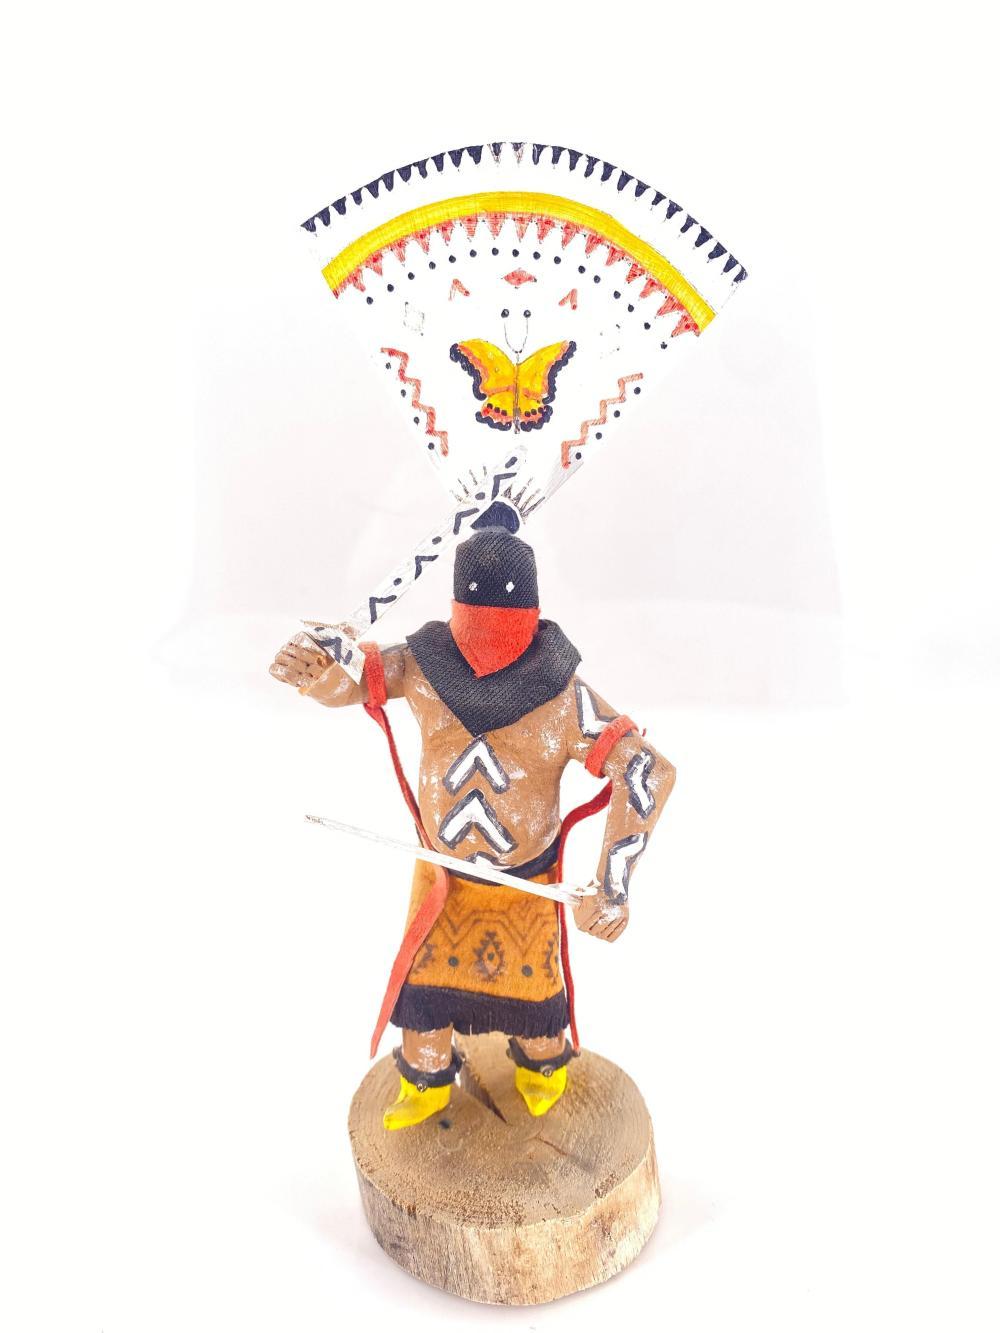 Native American Apache Crown Dancer Wood Kachina